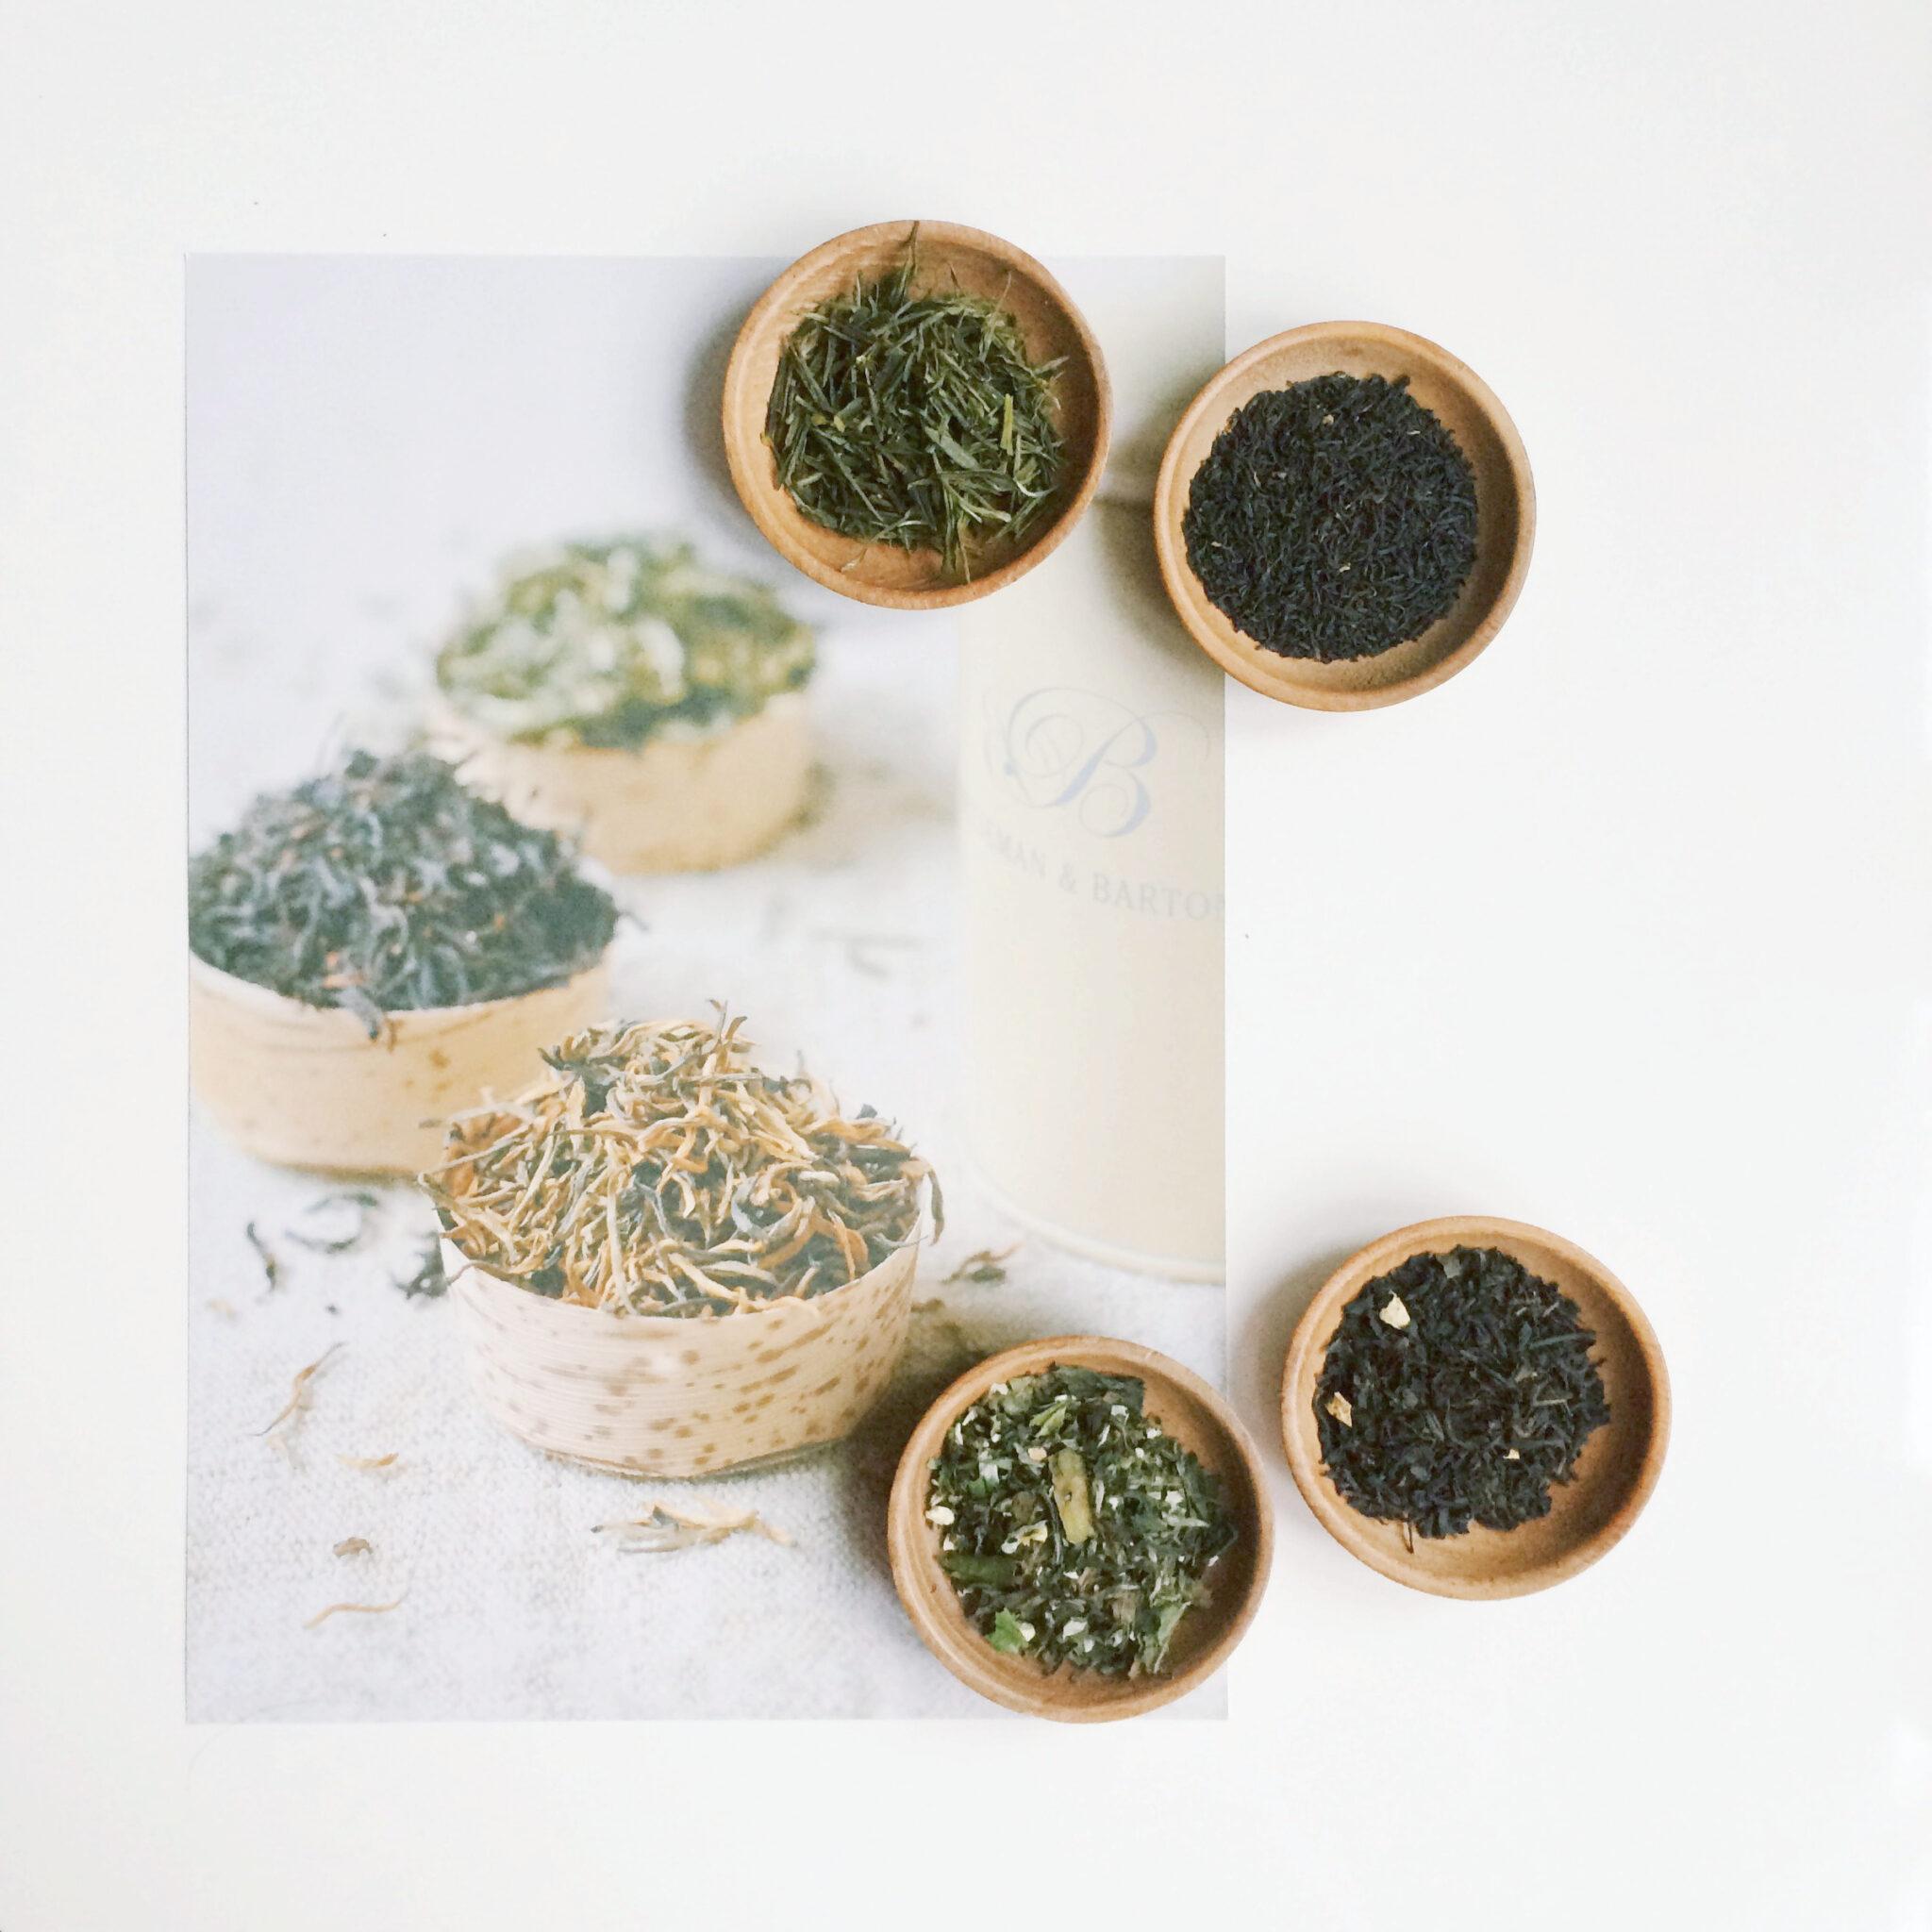 betjeman barton - Culi Tip: Beau-Teas from Betjeman & Barton